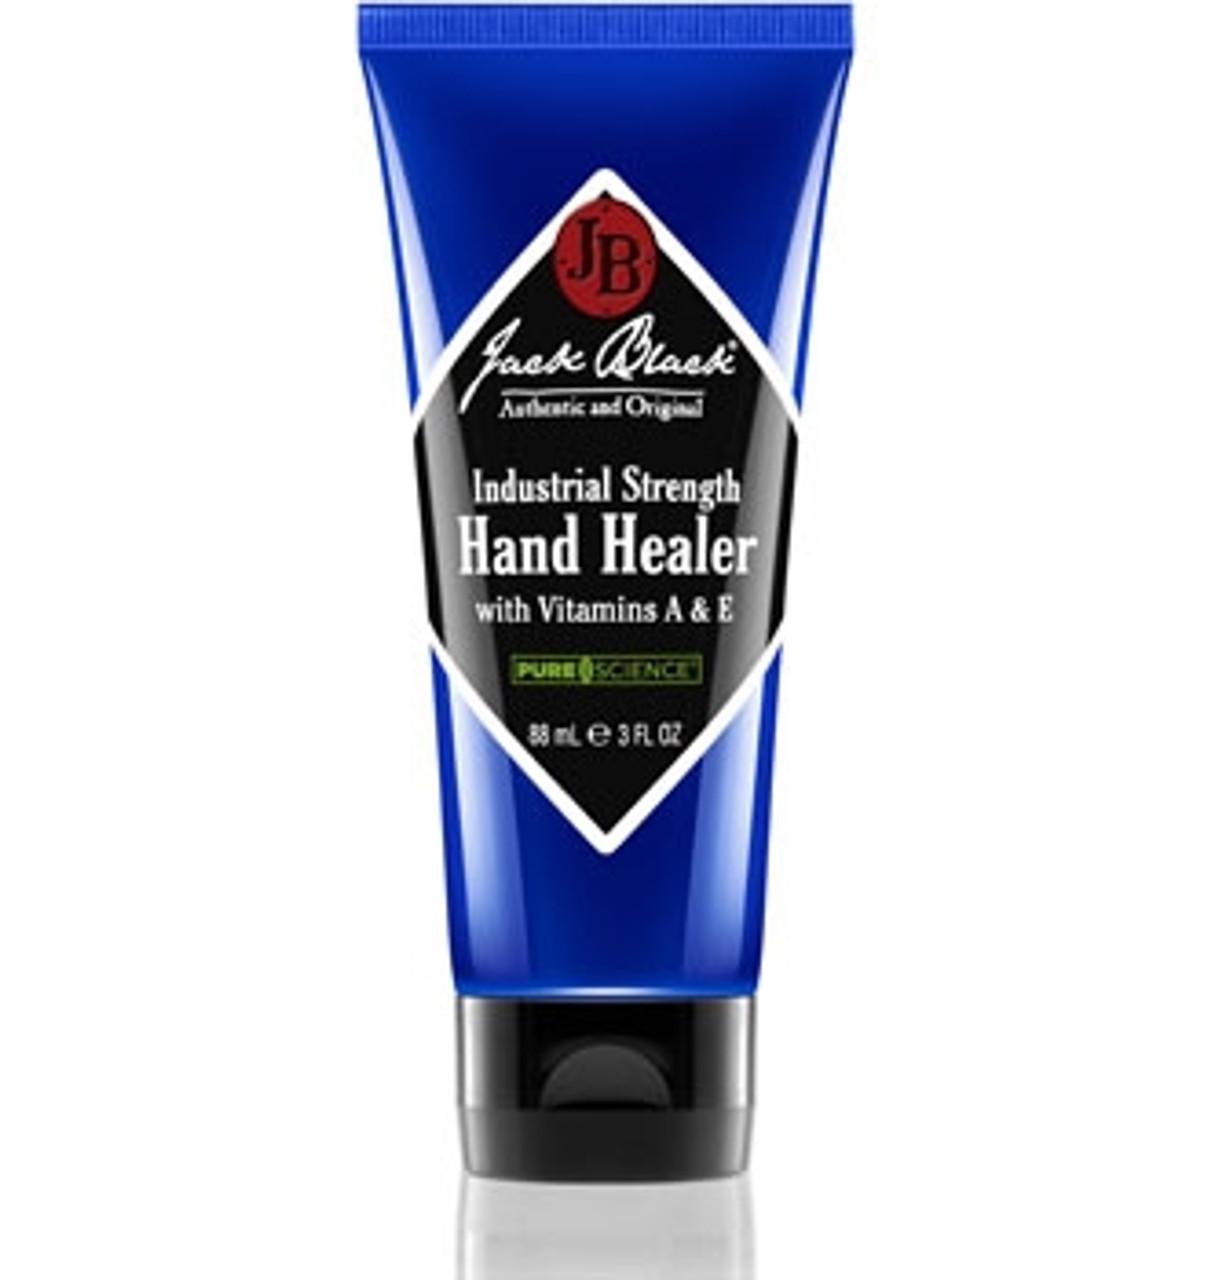 Jack Black Industrial Strength Hand Healer 3 oz